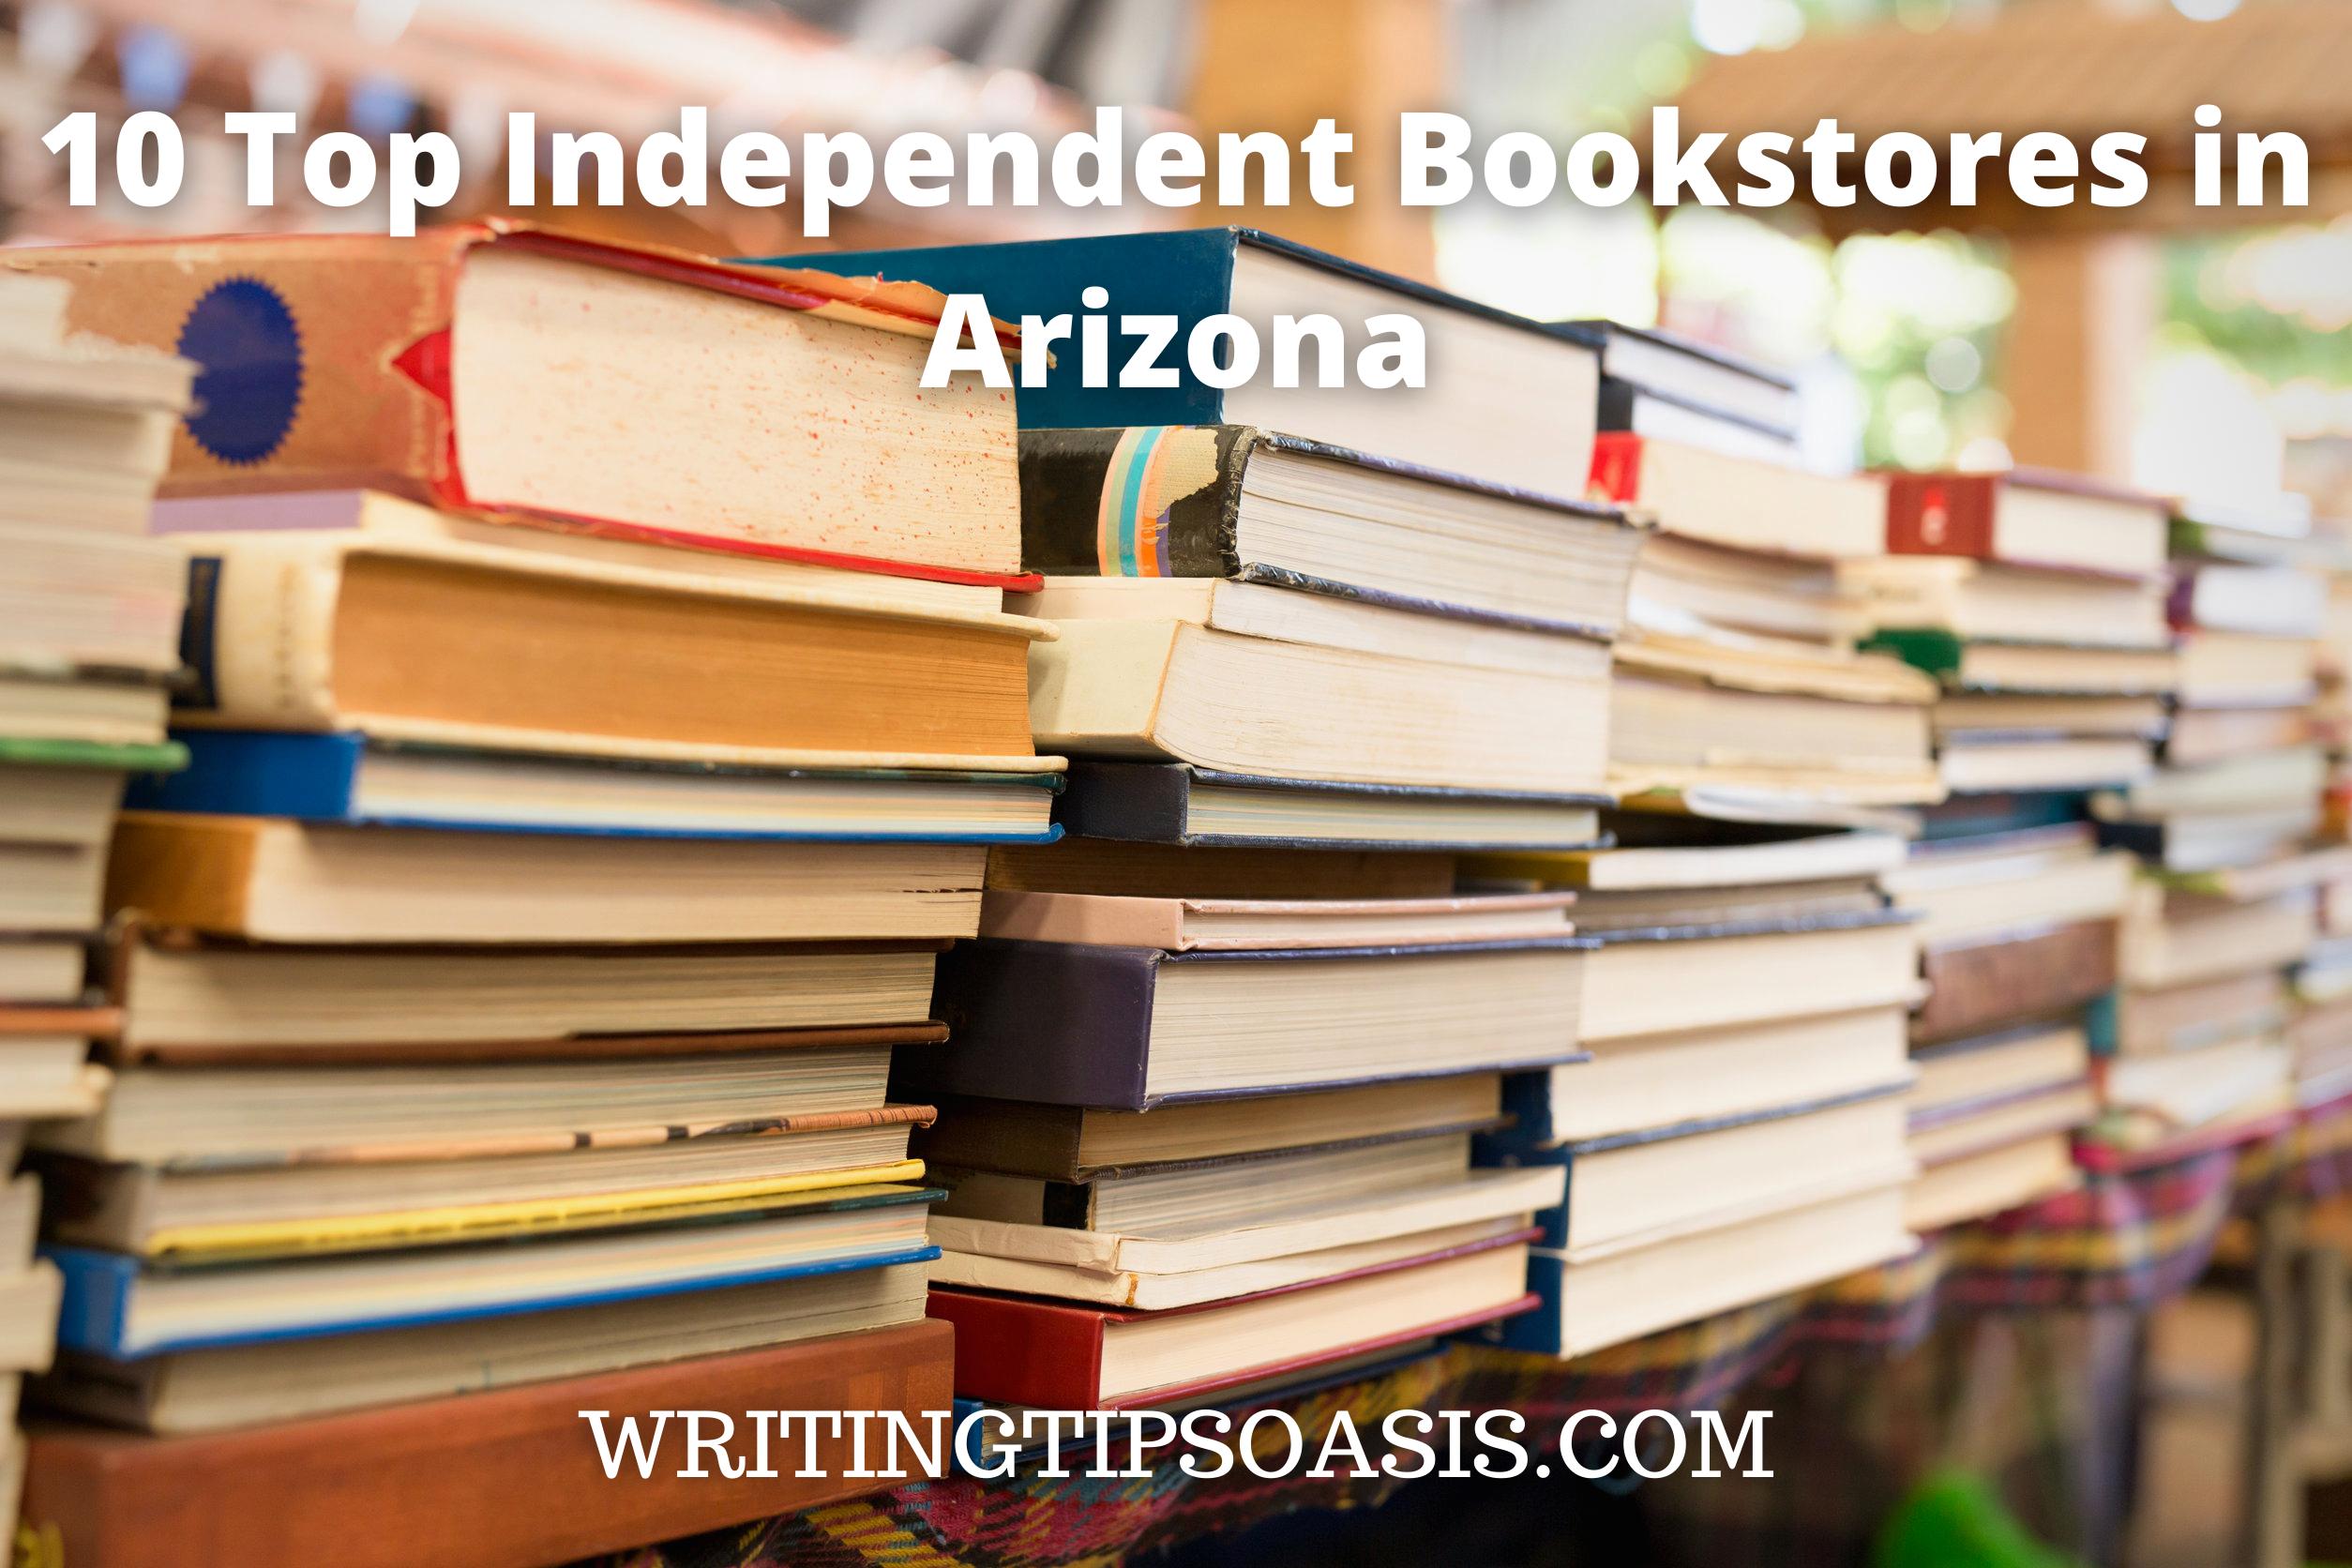 independent bookstores in Arizona